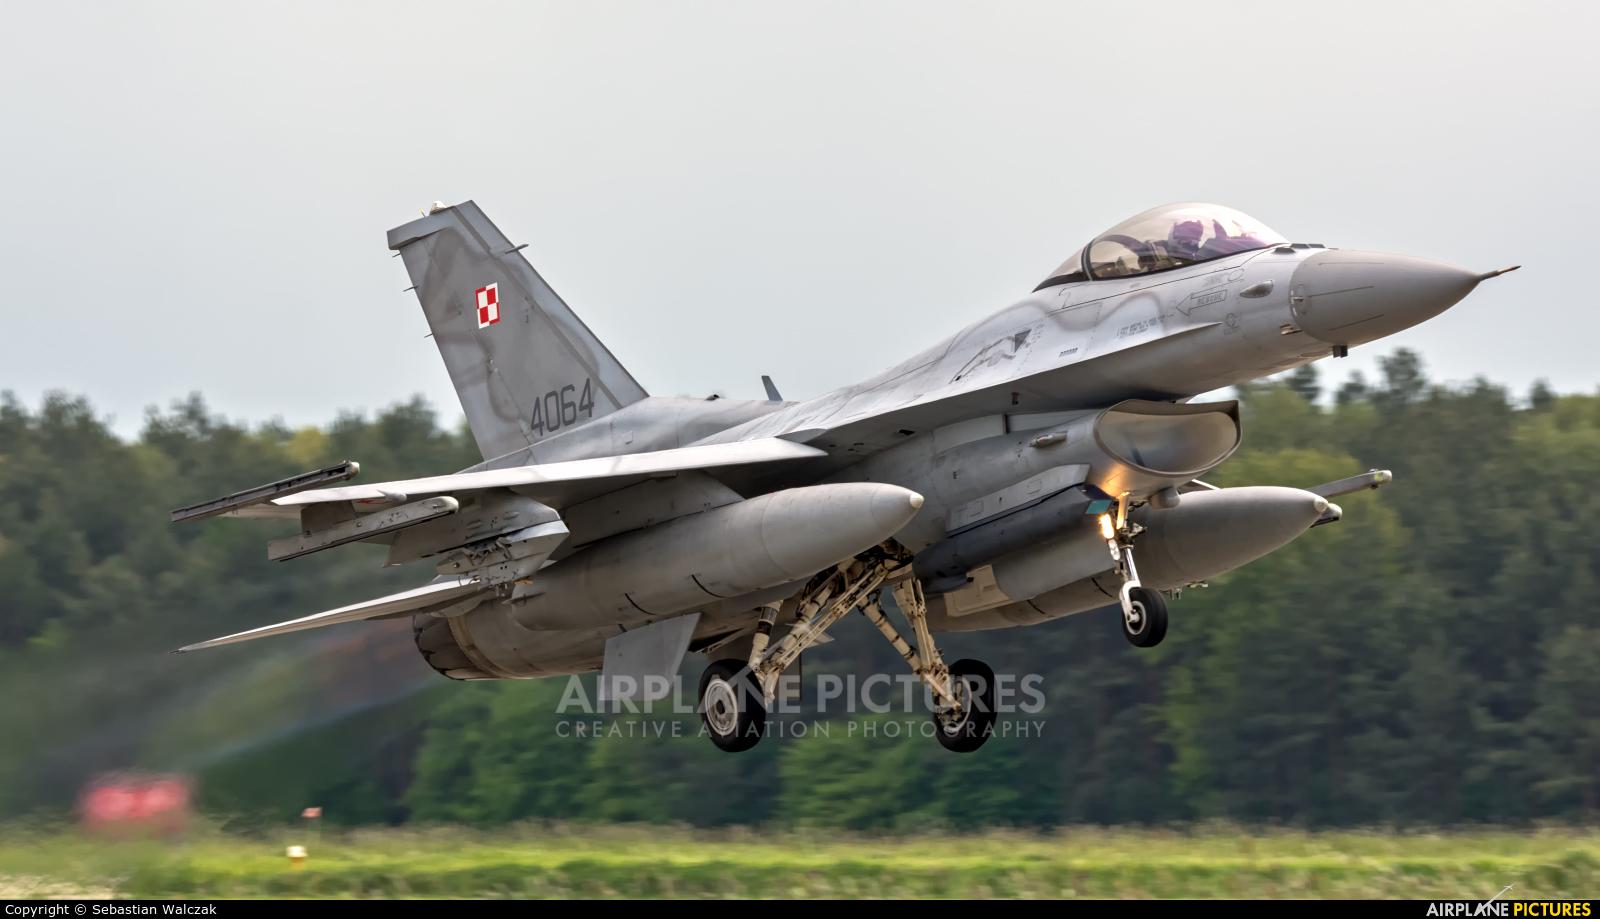 Poland - Air Force 4064 aircraft at Łask AB